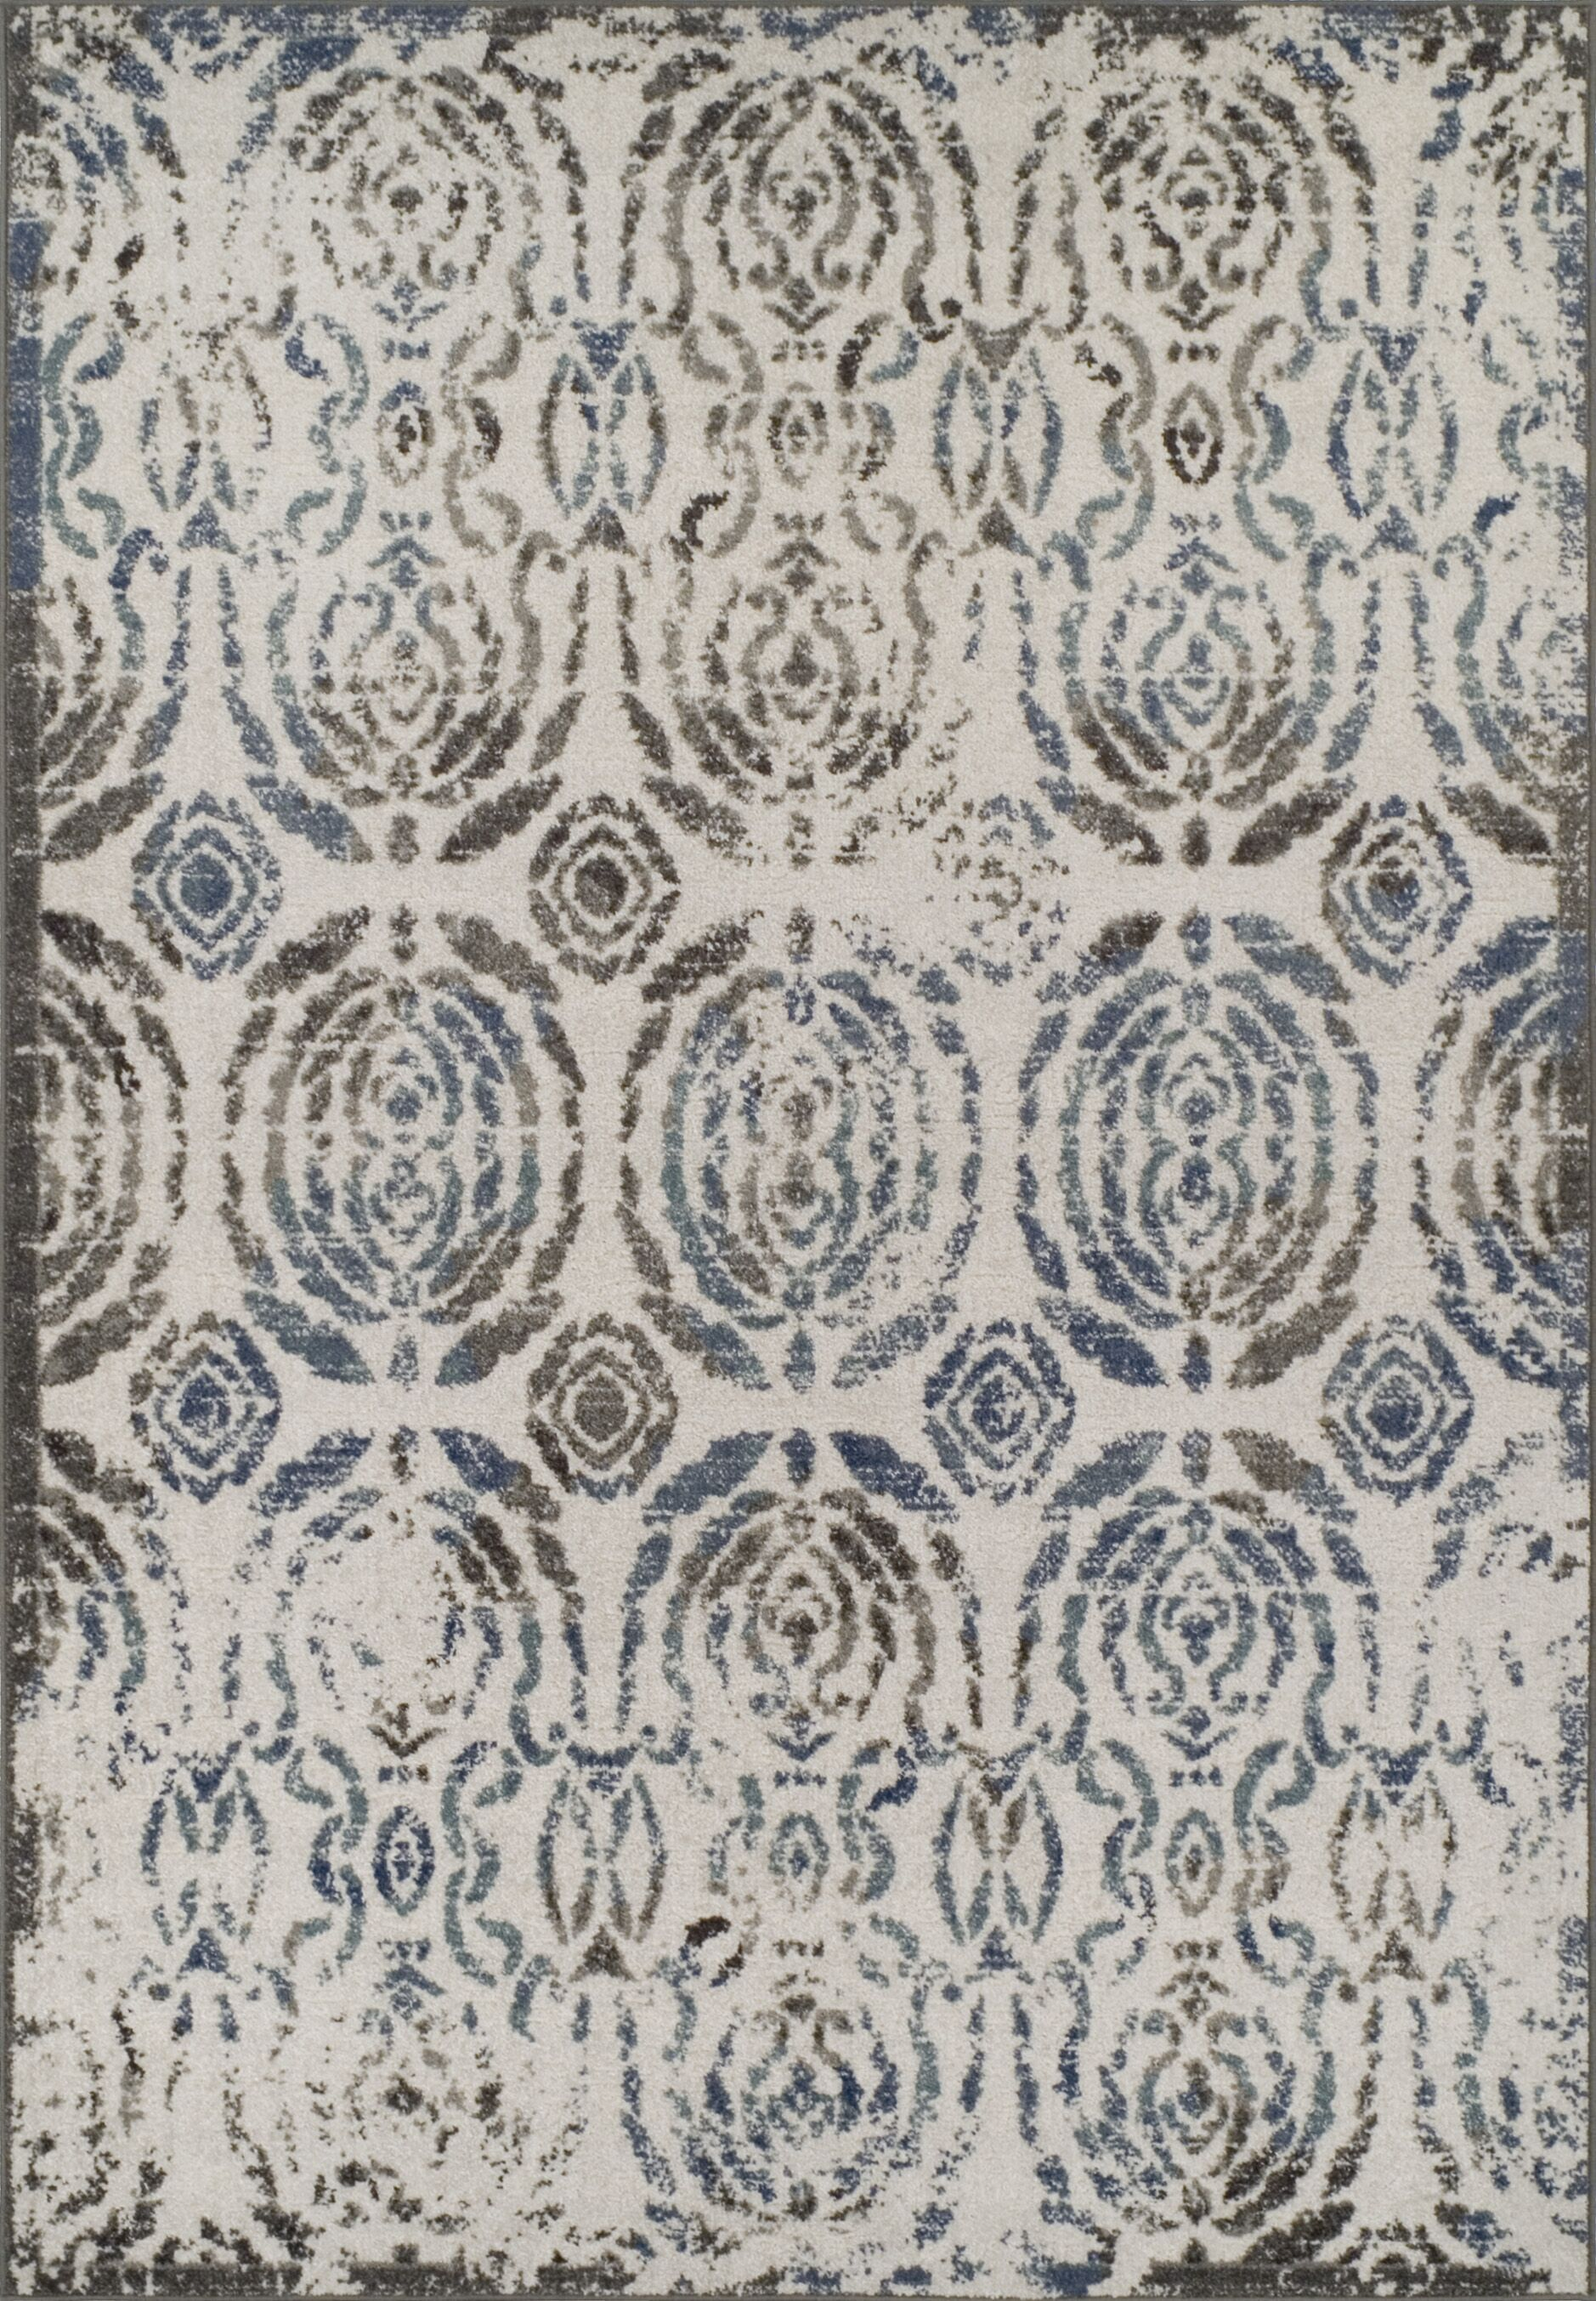 Hagopian Gray Area Rug Rug Size: Rectangle 7'10